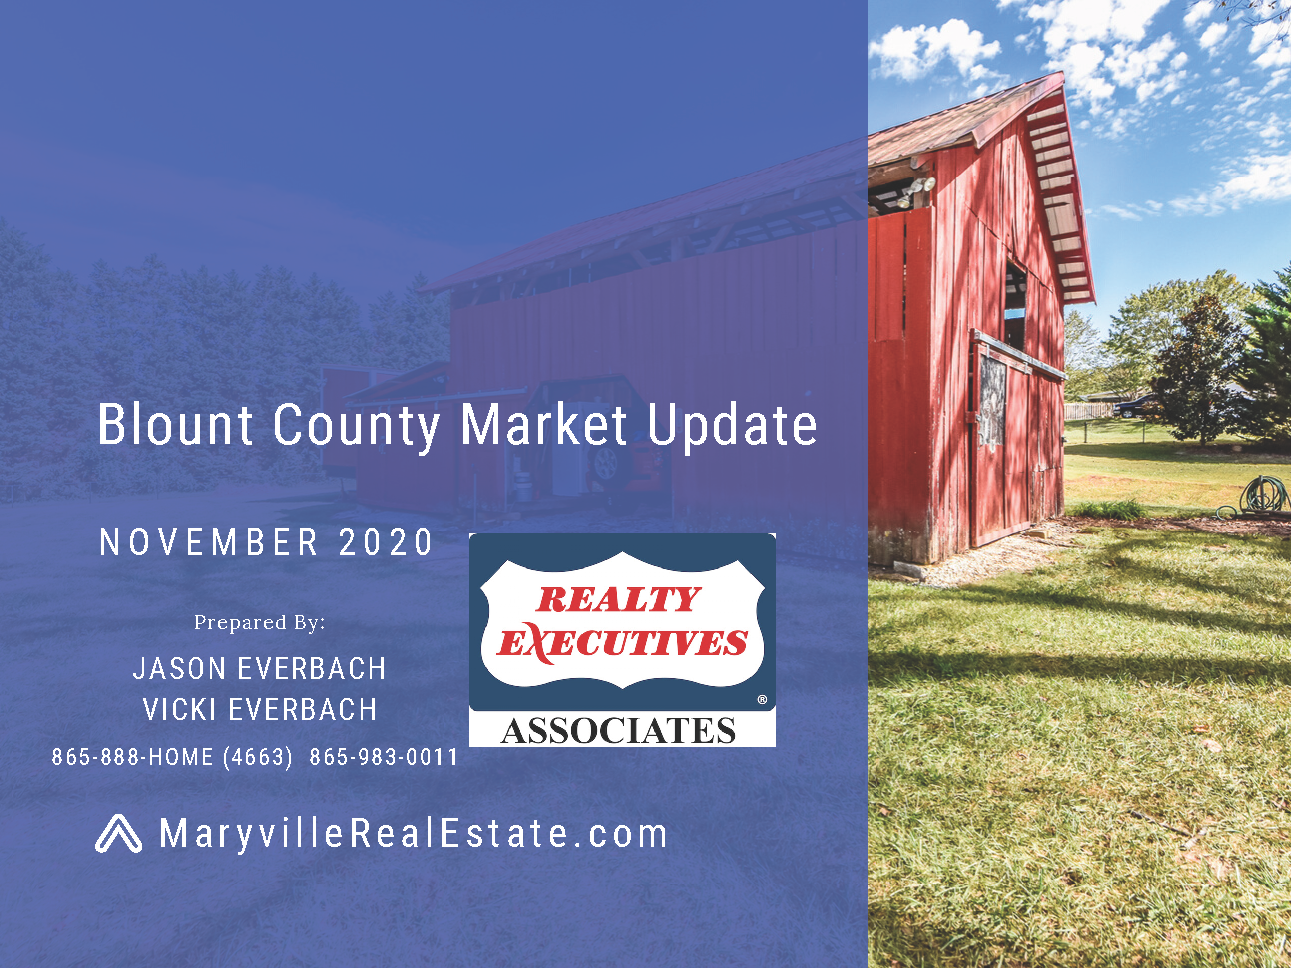 November 2020 Blount County Maryville Real Estate Market Update